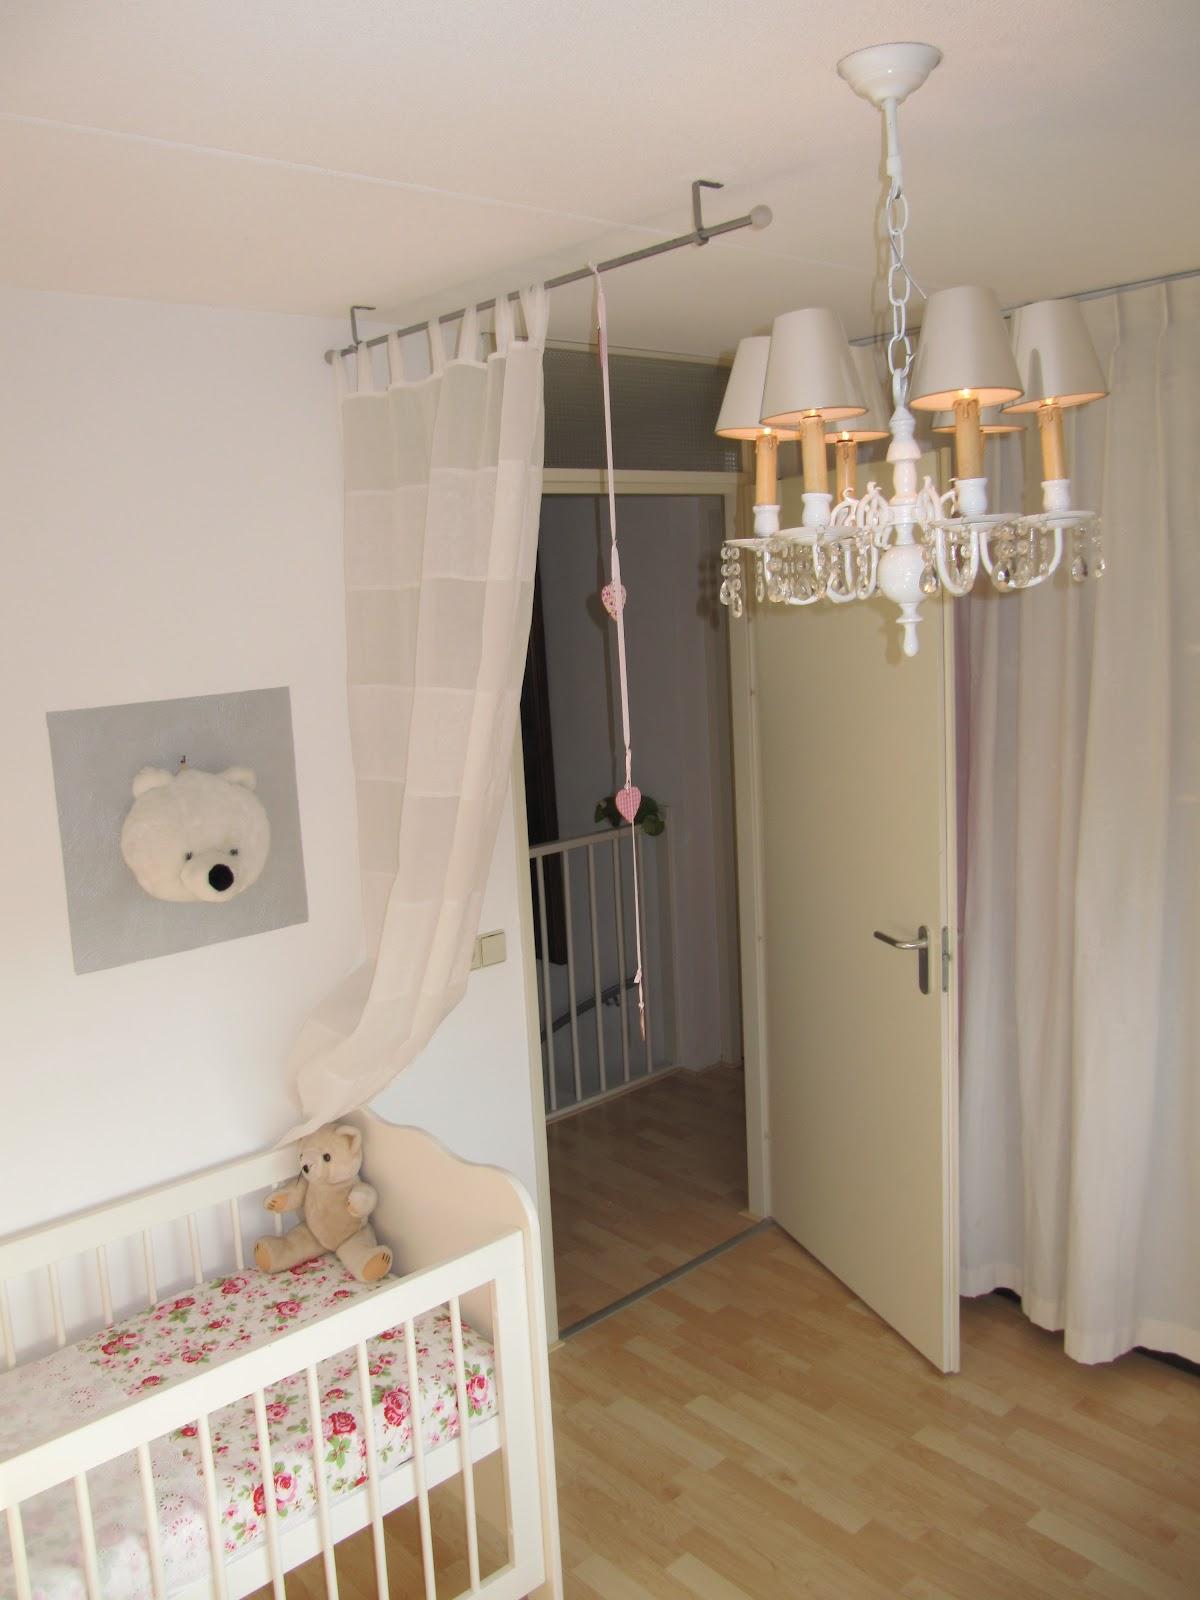 Is interieur styling babykamer - Deco ouder kamer ...